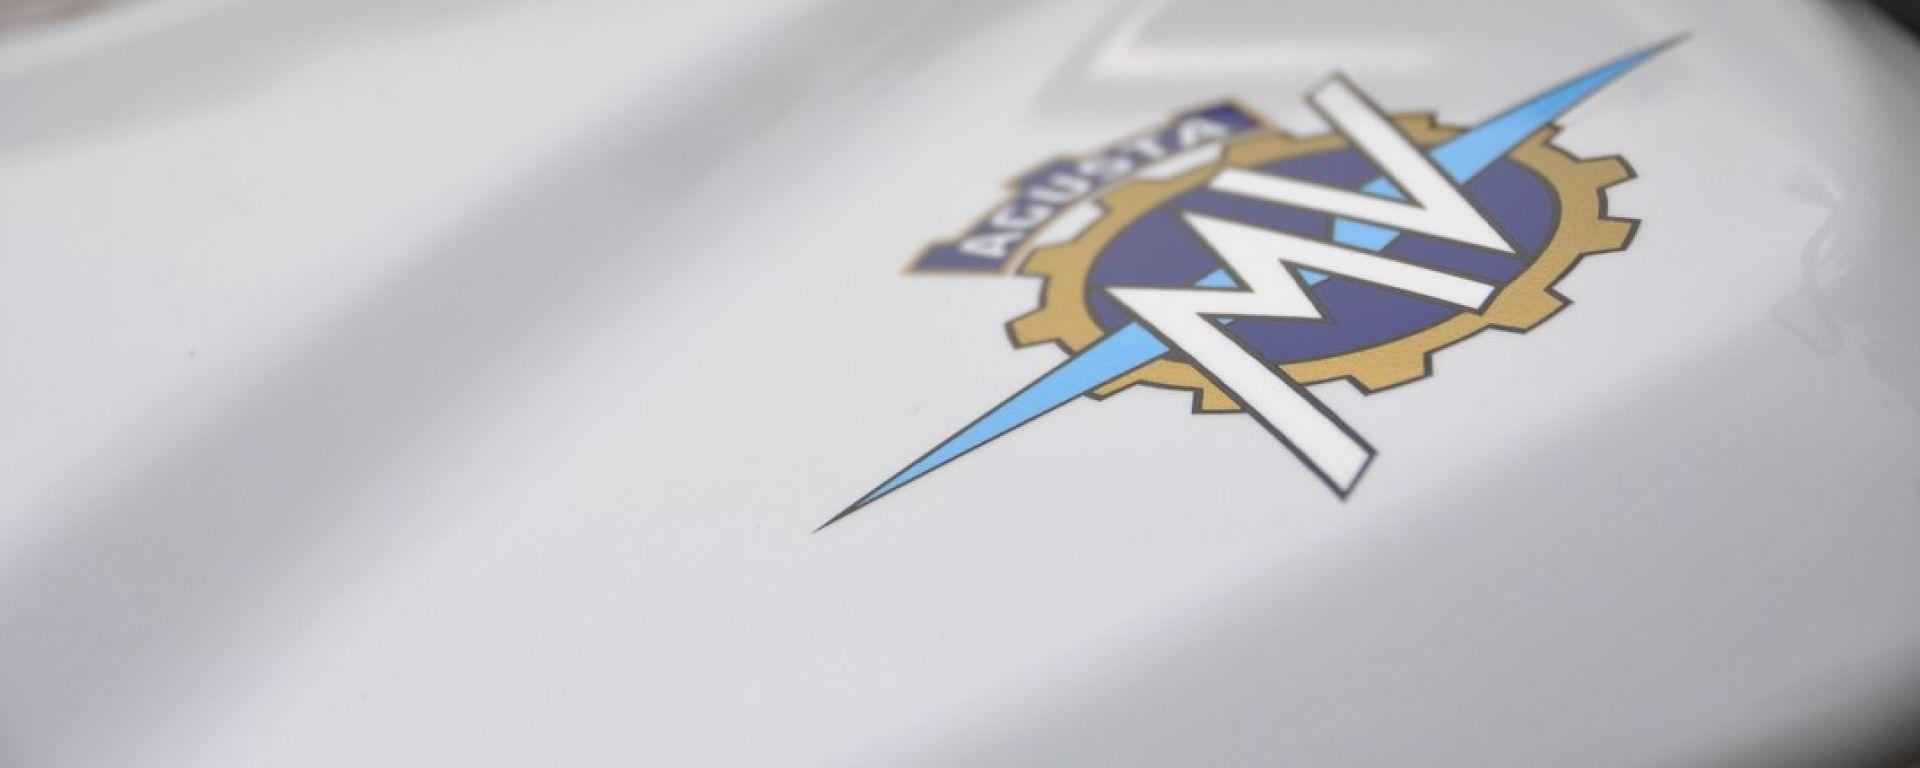 MV Agusta, marchio